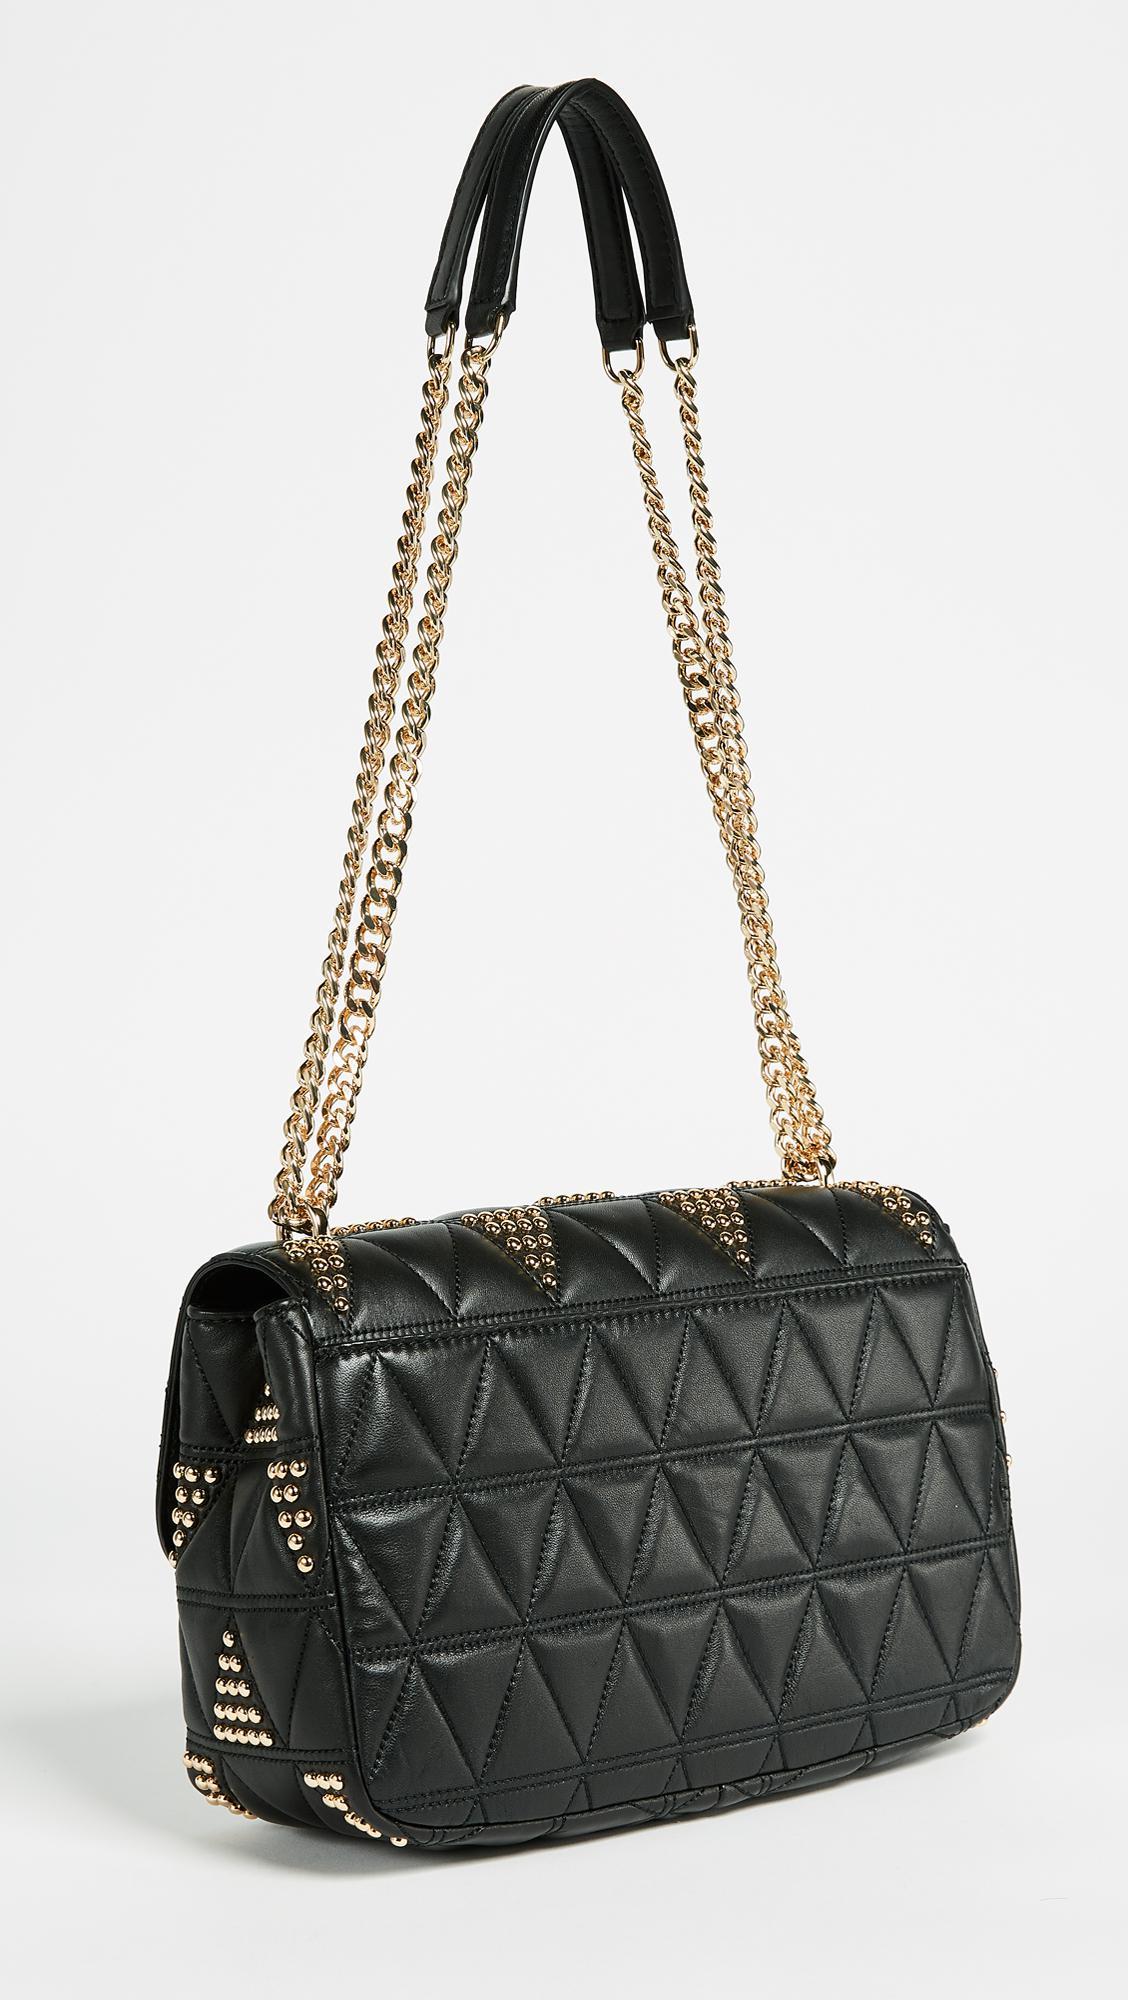 c6094d943f75 Lyst - Michael Michael Kors Sloan Large Chain Shoulder Bag in Black